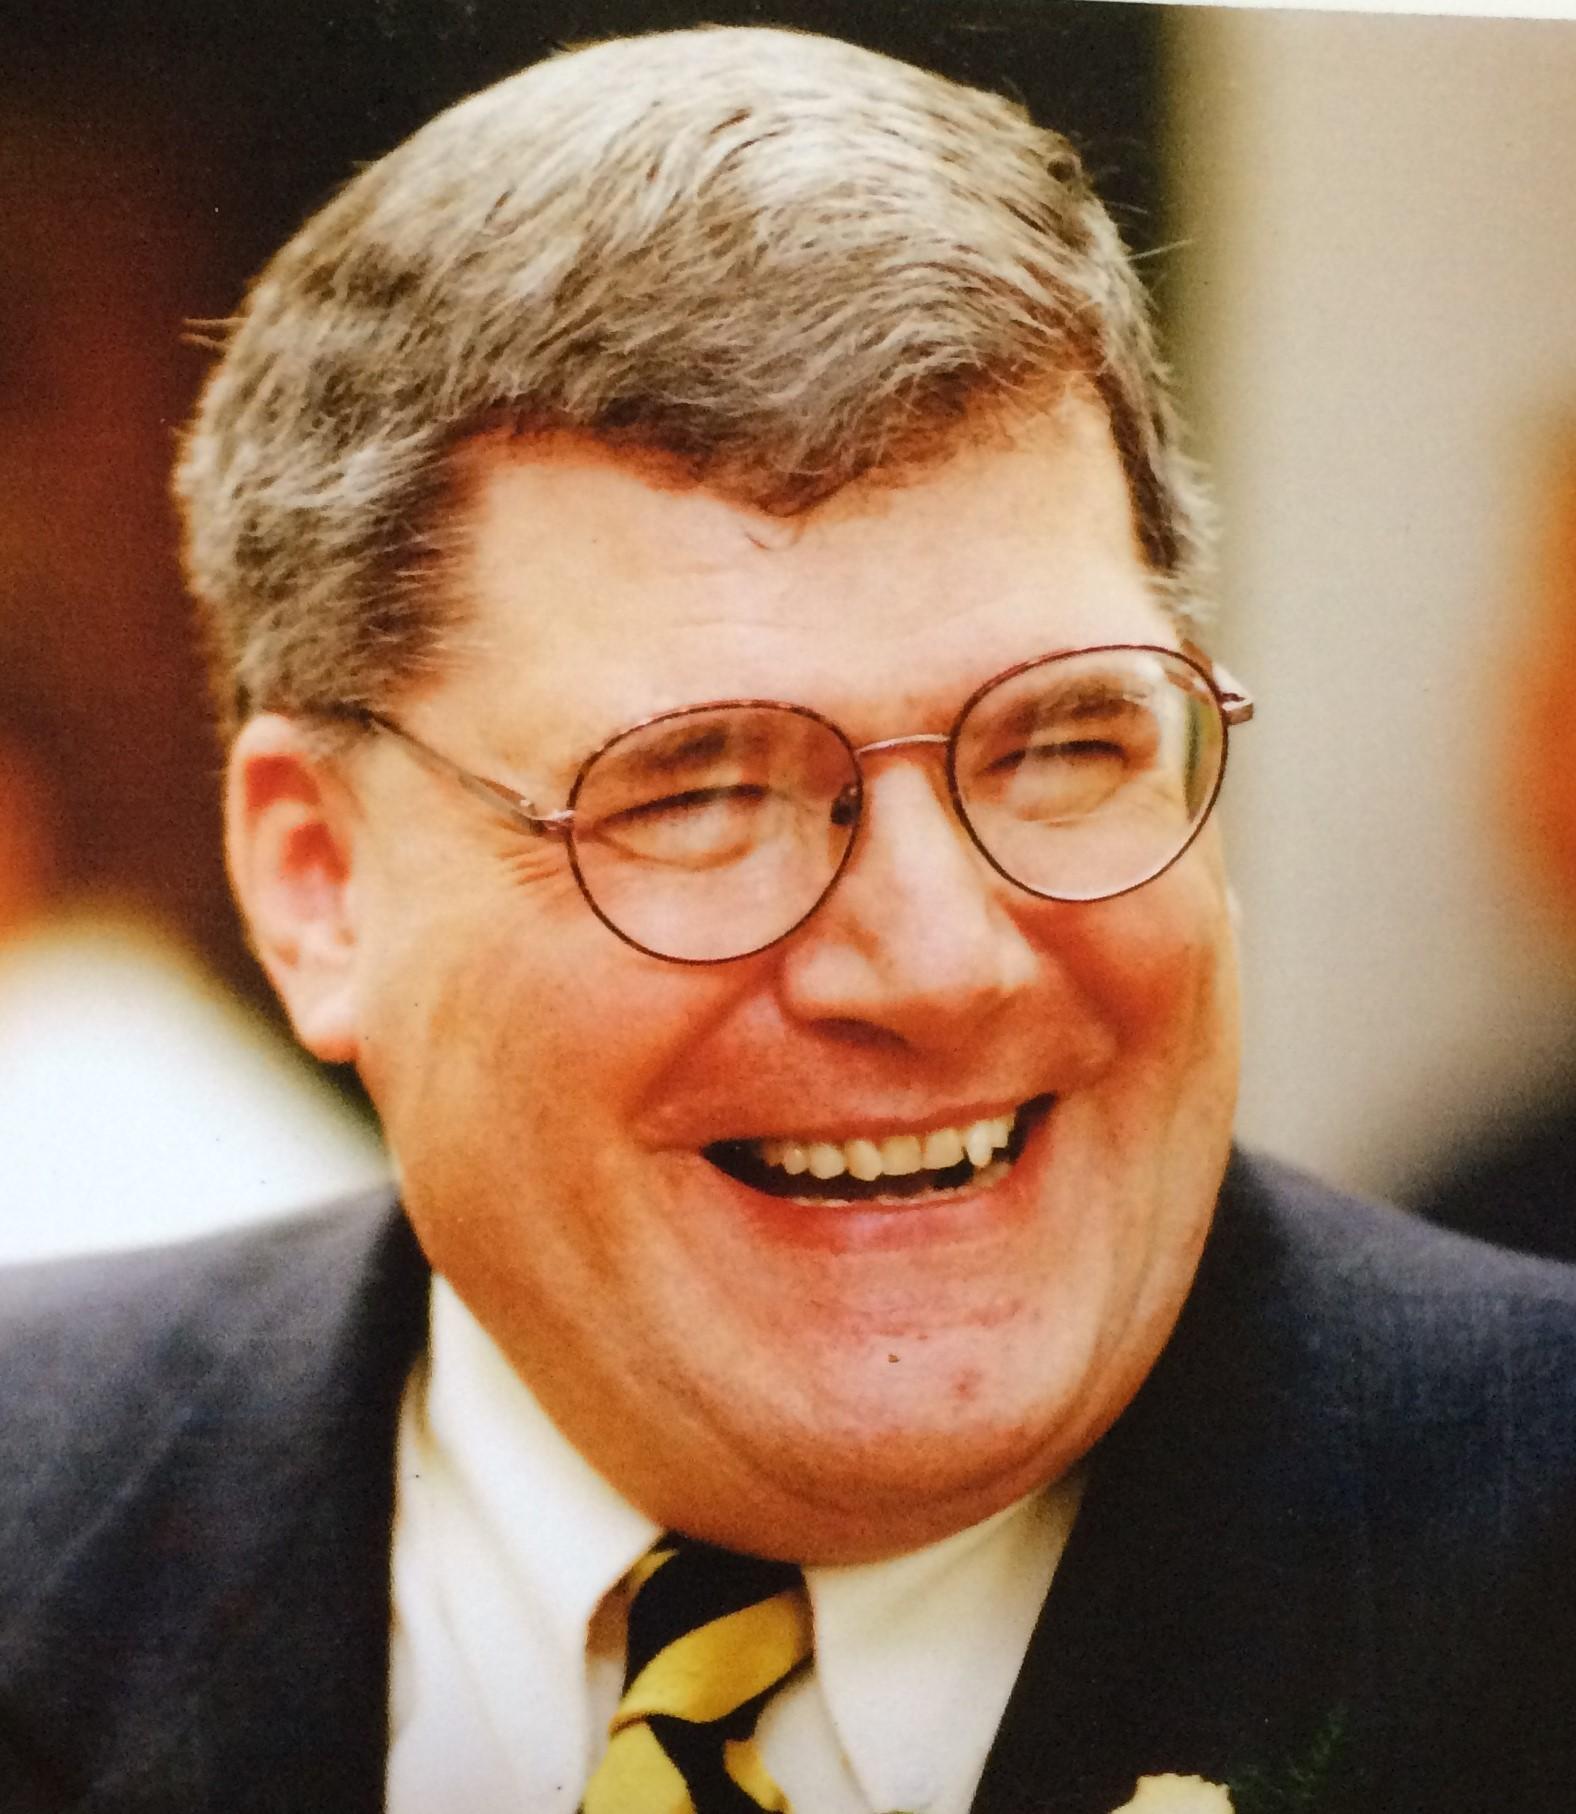 Thomas G. Meehan